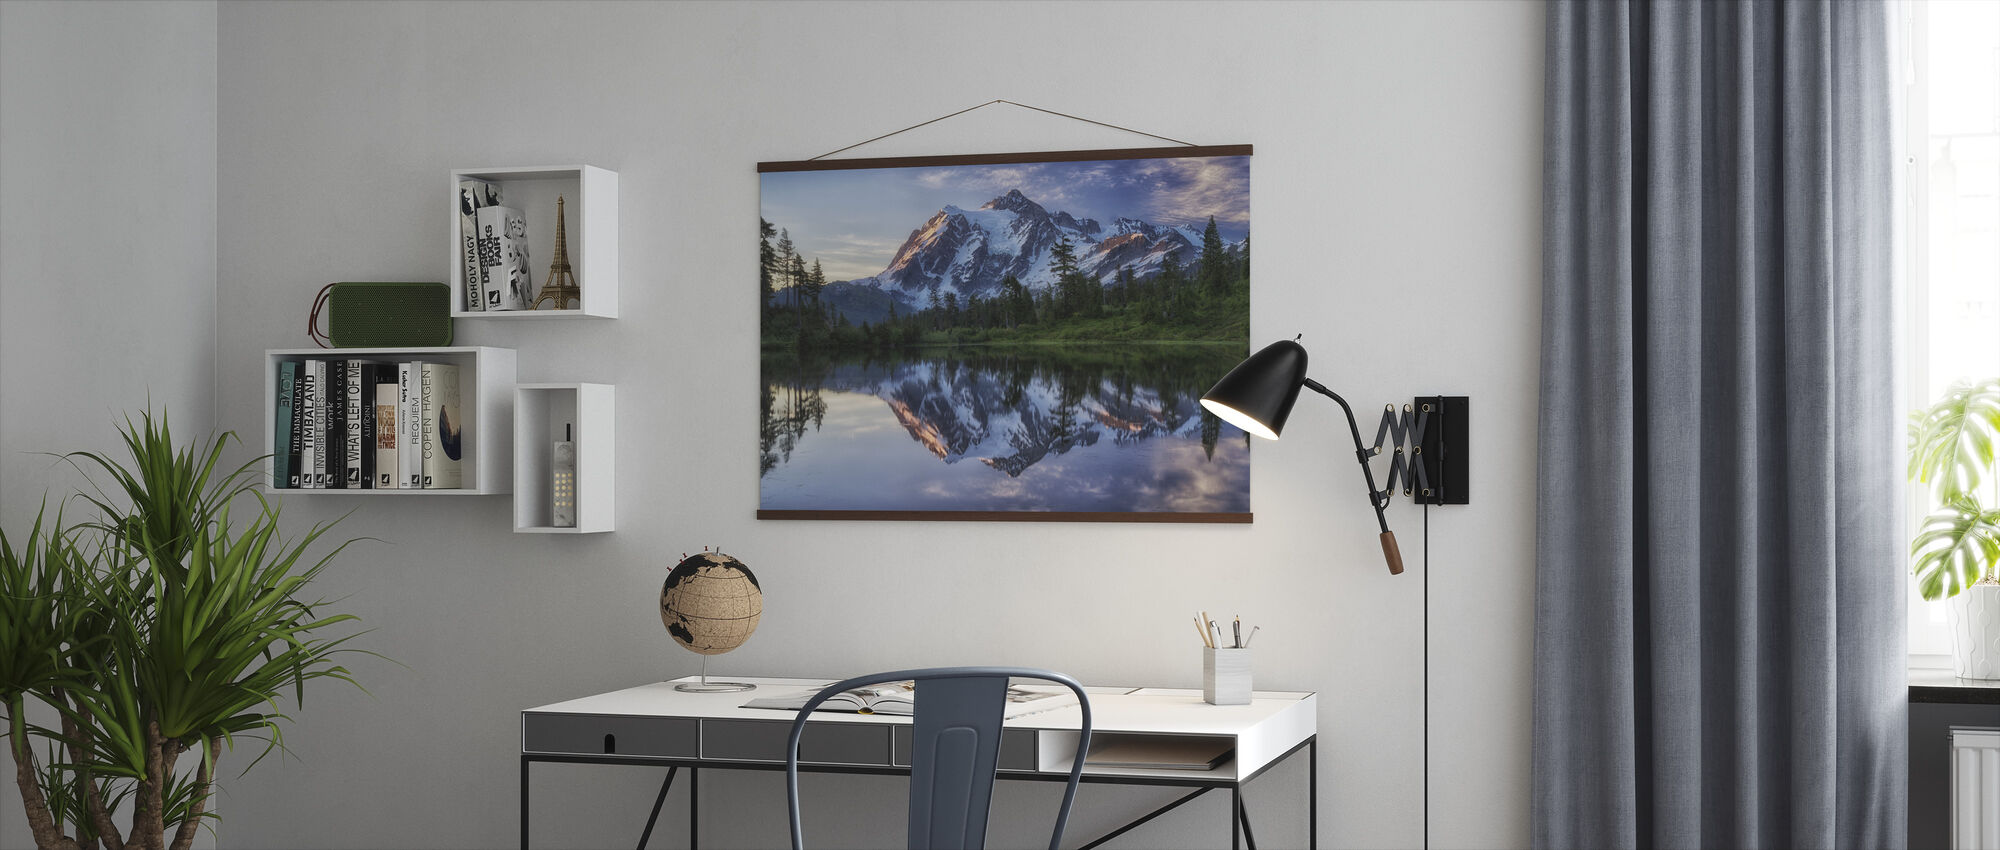 Sunrise on Mount Shuksan, Washington, USA - Poster - Office